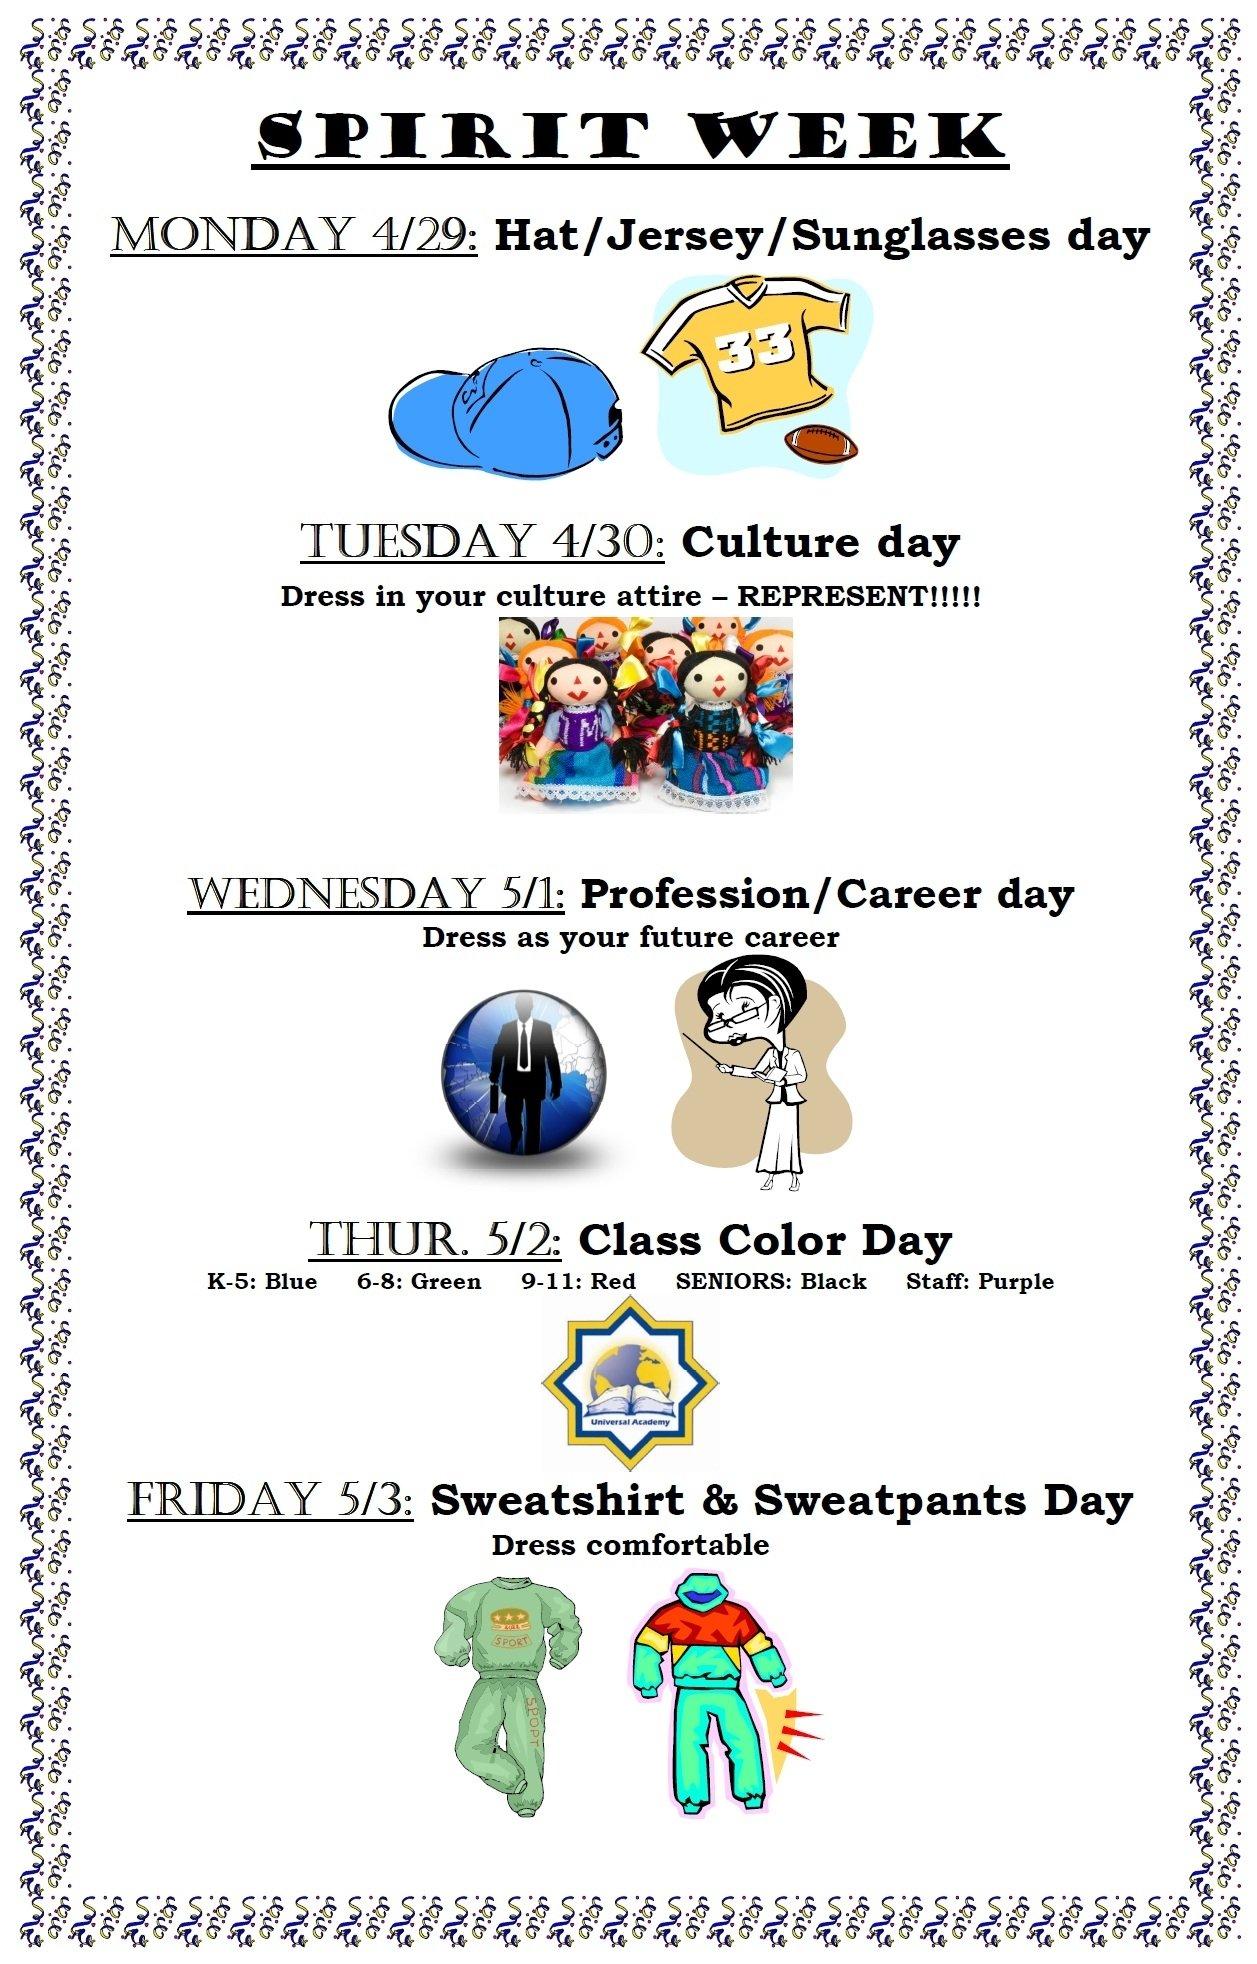 10 Stylish Good Ideas For Spirit Week spirit week 2013 spirit week pinterest school week students 9 2020